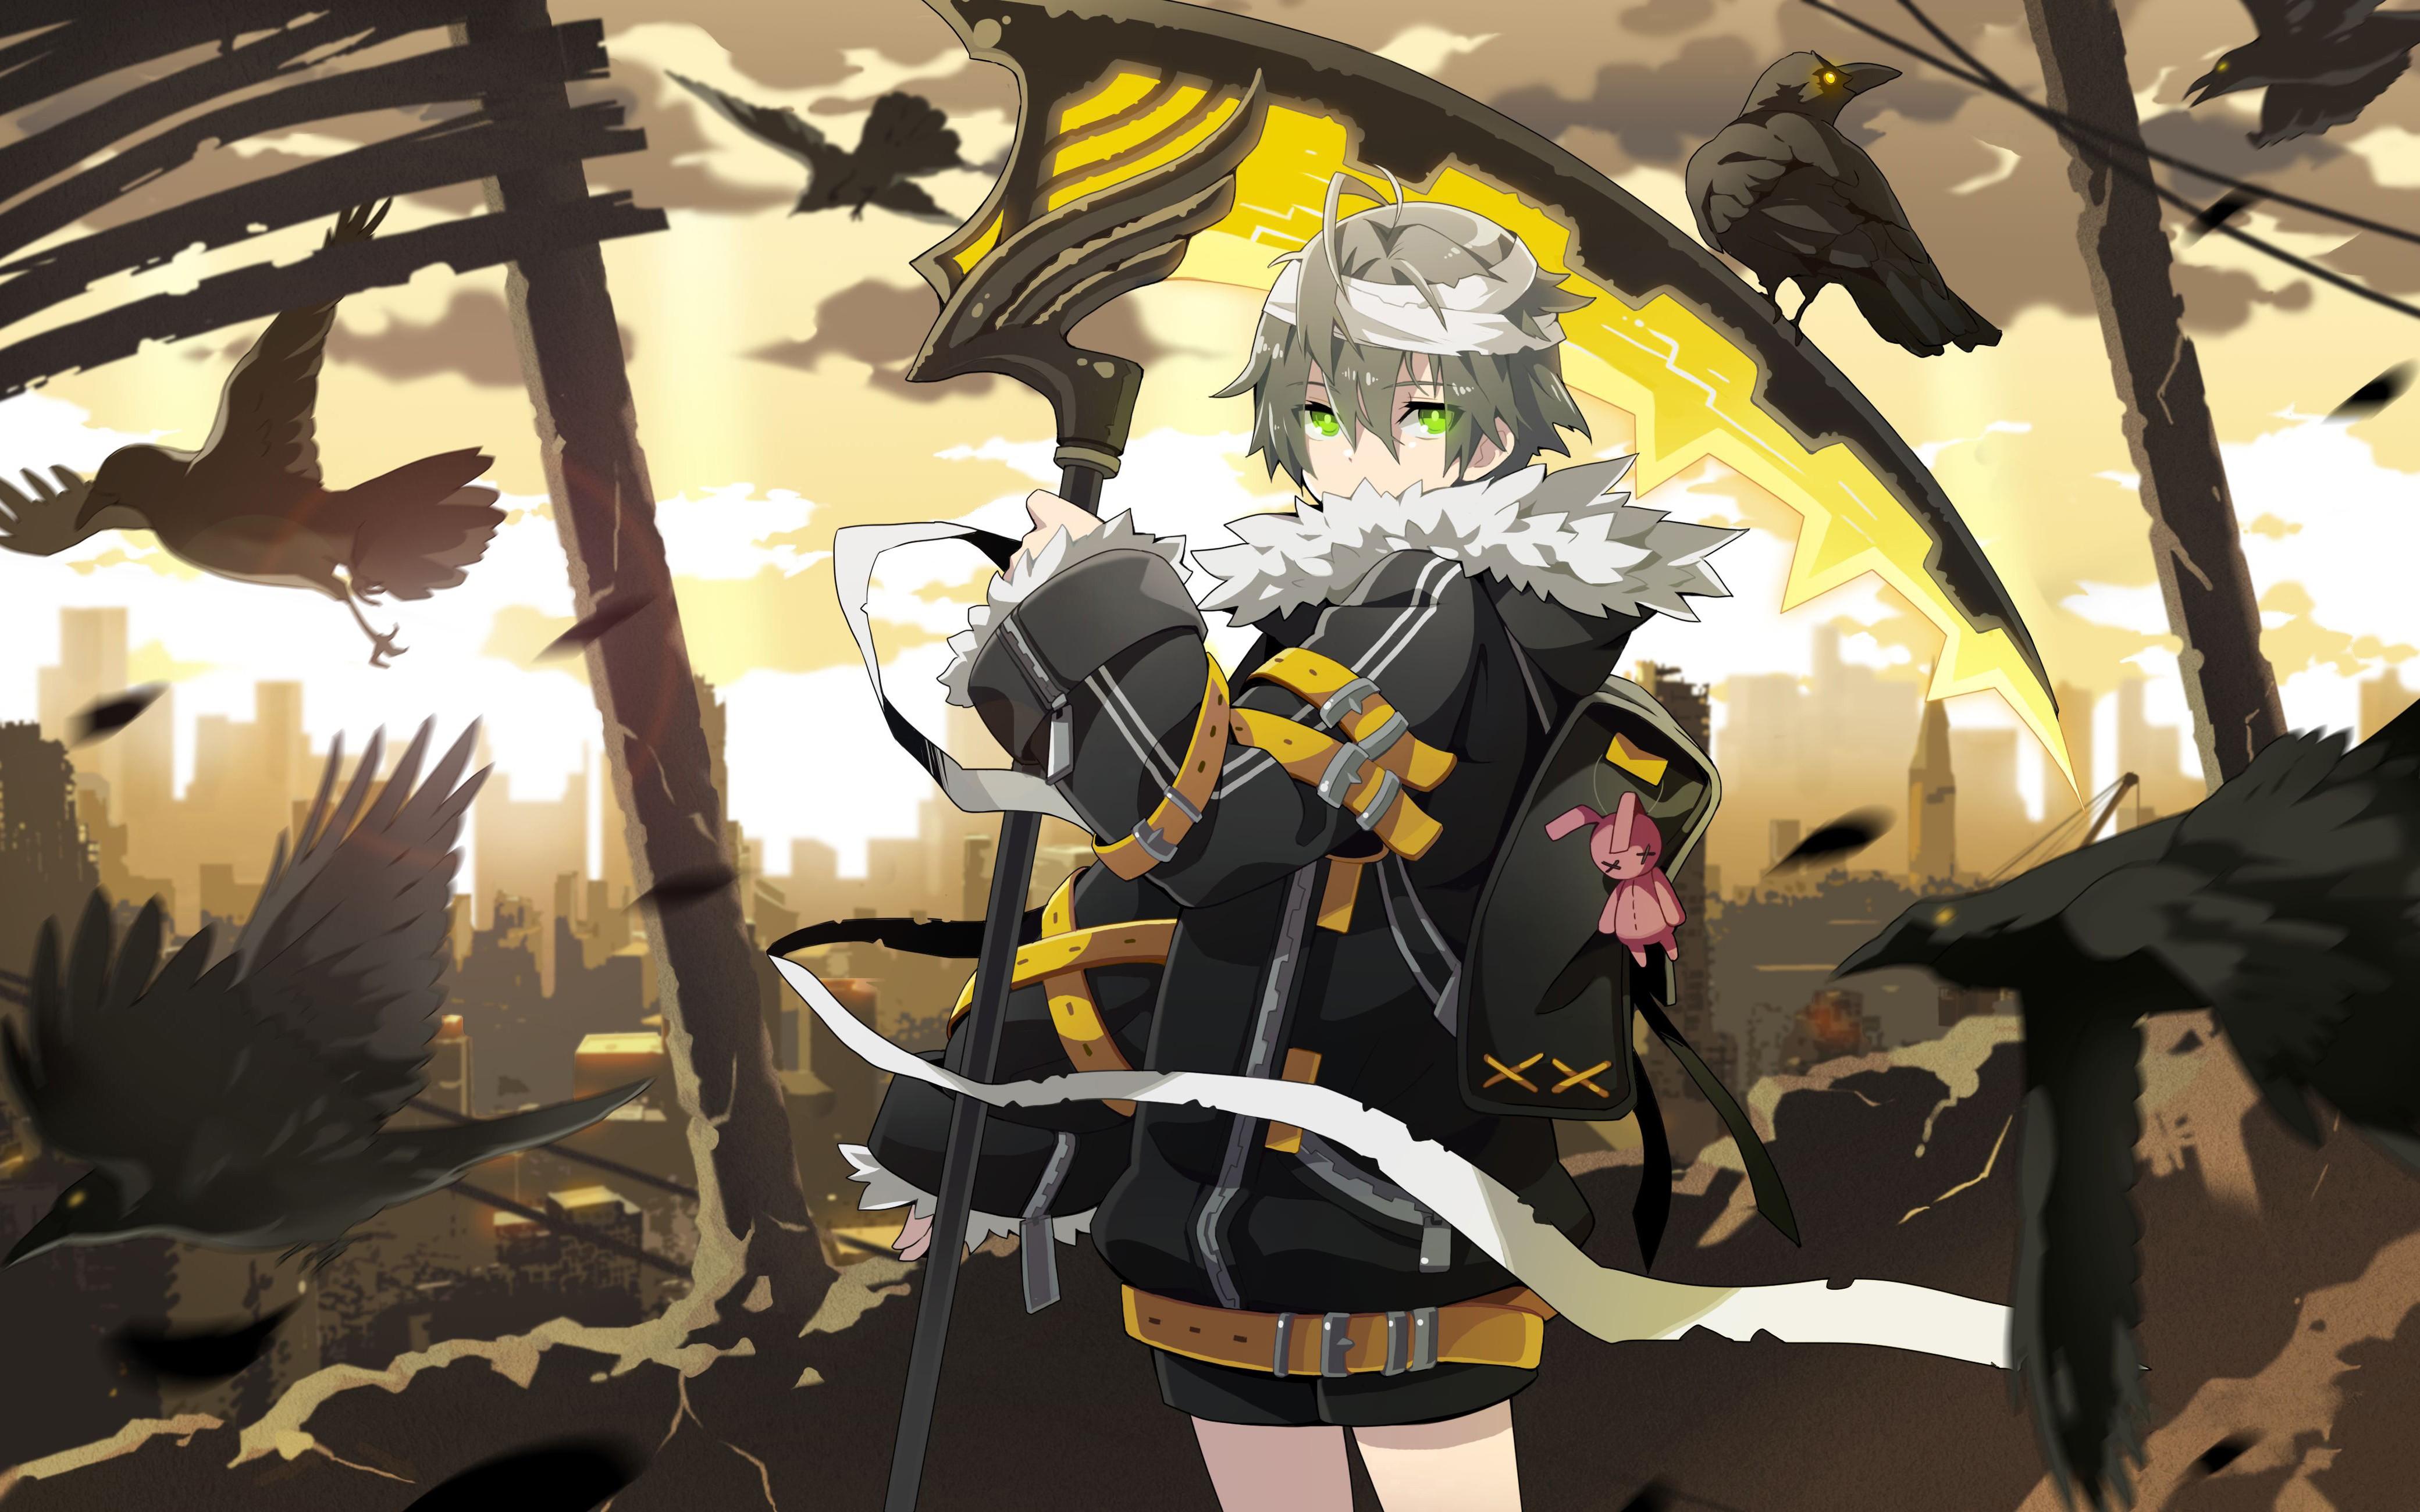 Wallpaper : Soul Worker, weapon, anime boys, scythe, crown, shorts